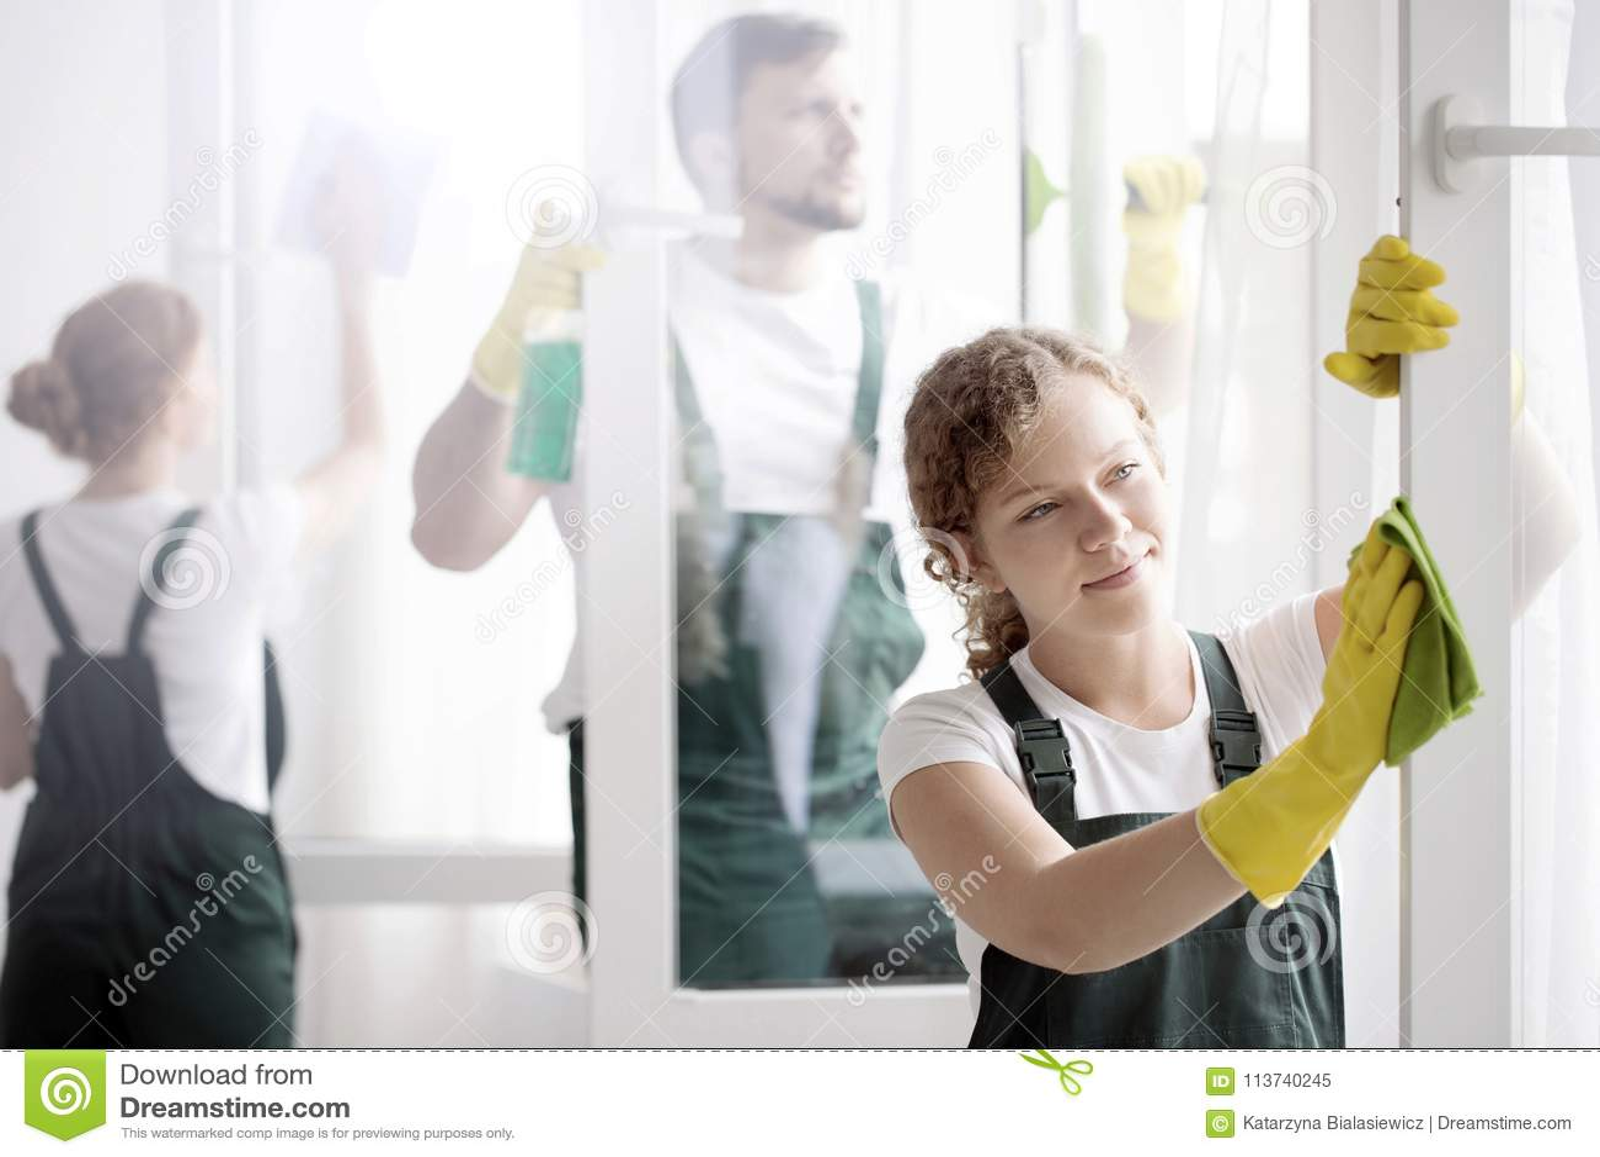 Woman Washing Window`s Frame Stock Image - Image of apartment, group ...